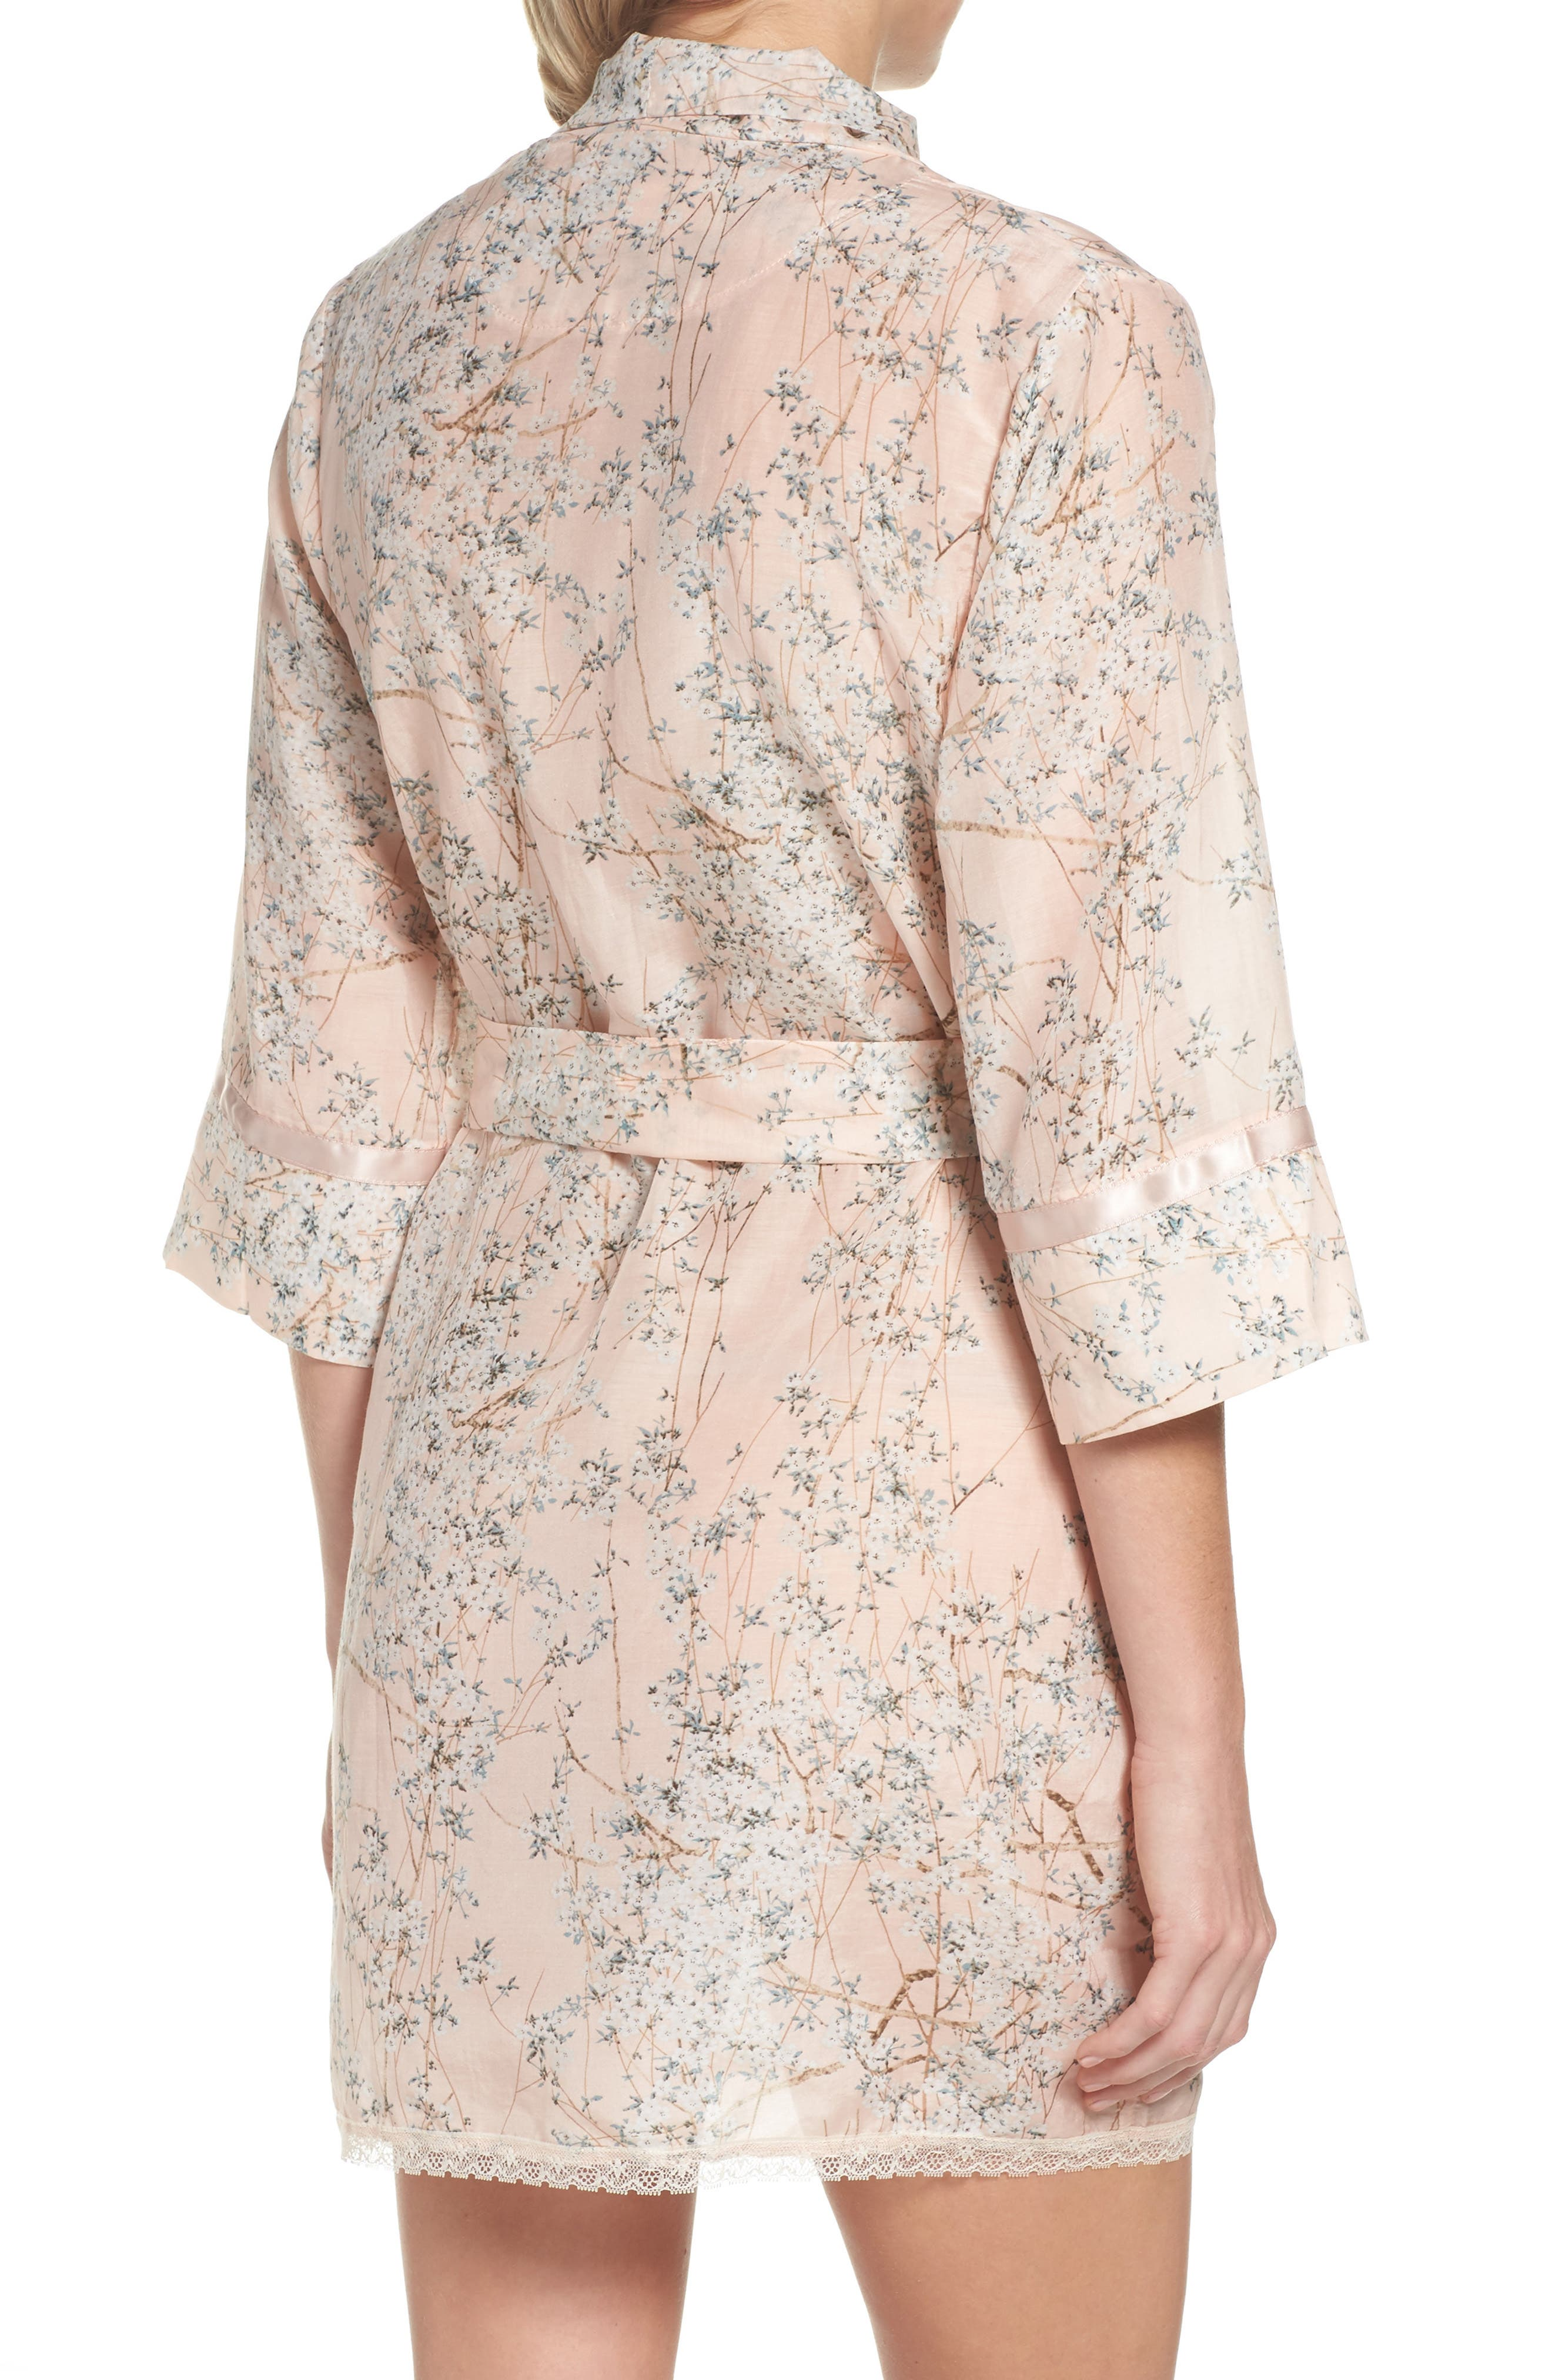 PAPINELLE,                             Cherry Blossom Cotton & Silk Short Robe,                             Alternate thumbnail 2, color,                             950